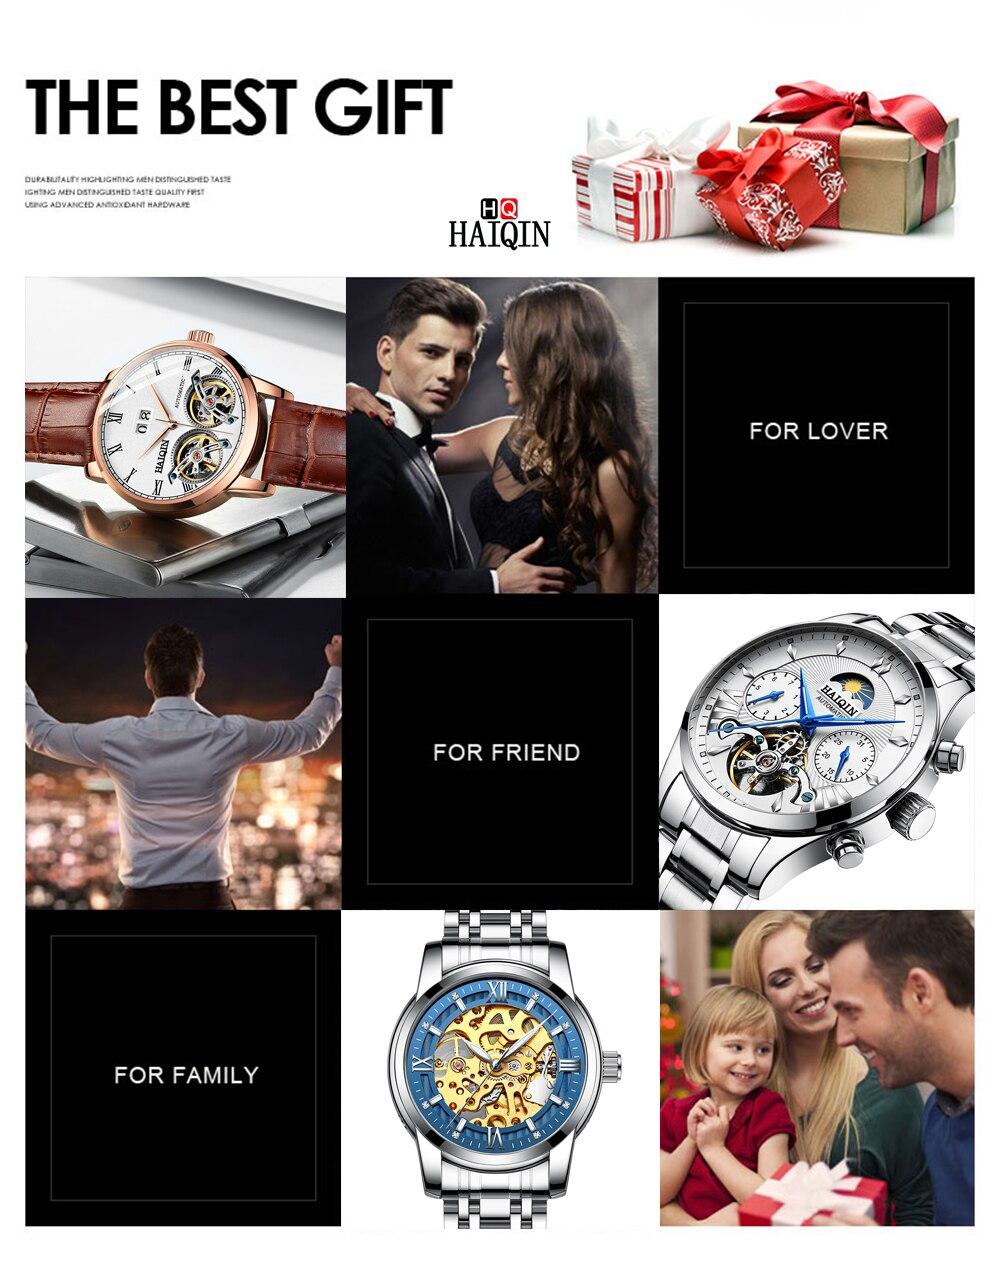 HTB1Lj1HXPDuK1Rjy1zjq6zraFXaw HAIQIN luxury Automatic Mechanical Men Watch classic Business Watch men Tourbillon Waterproof Male Wristwatch Relogio Masculino